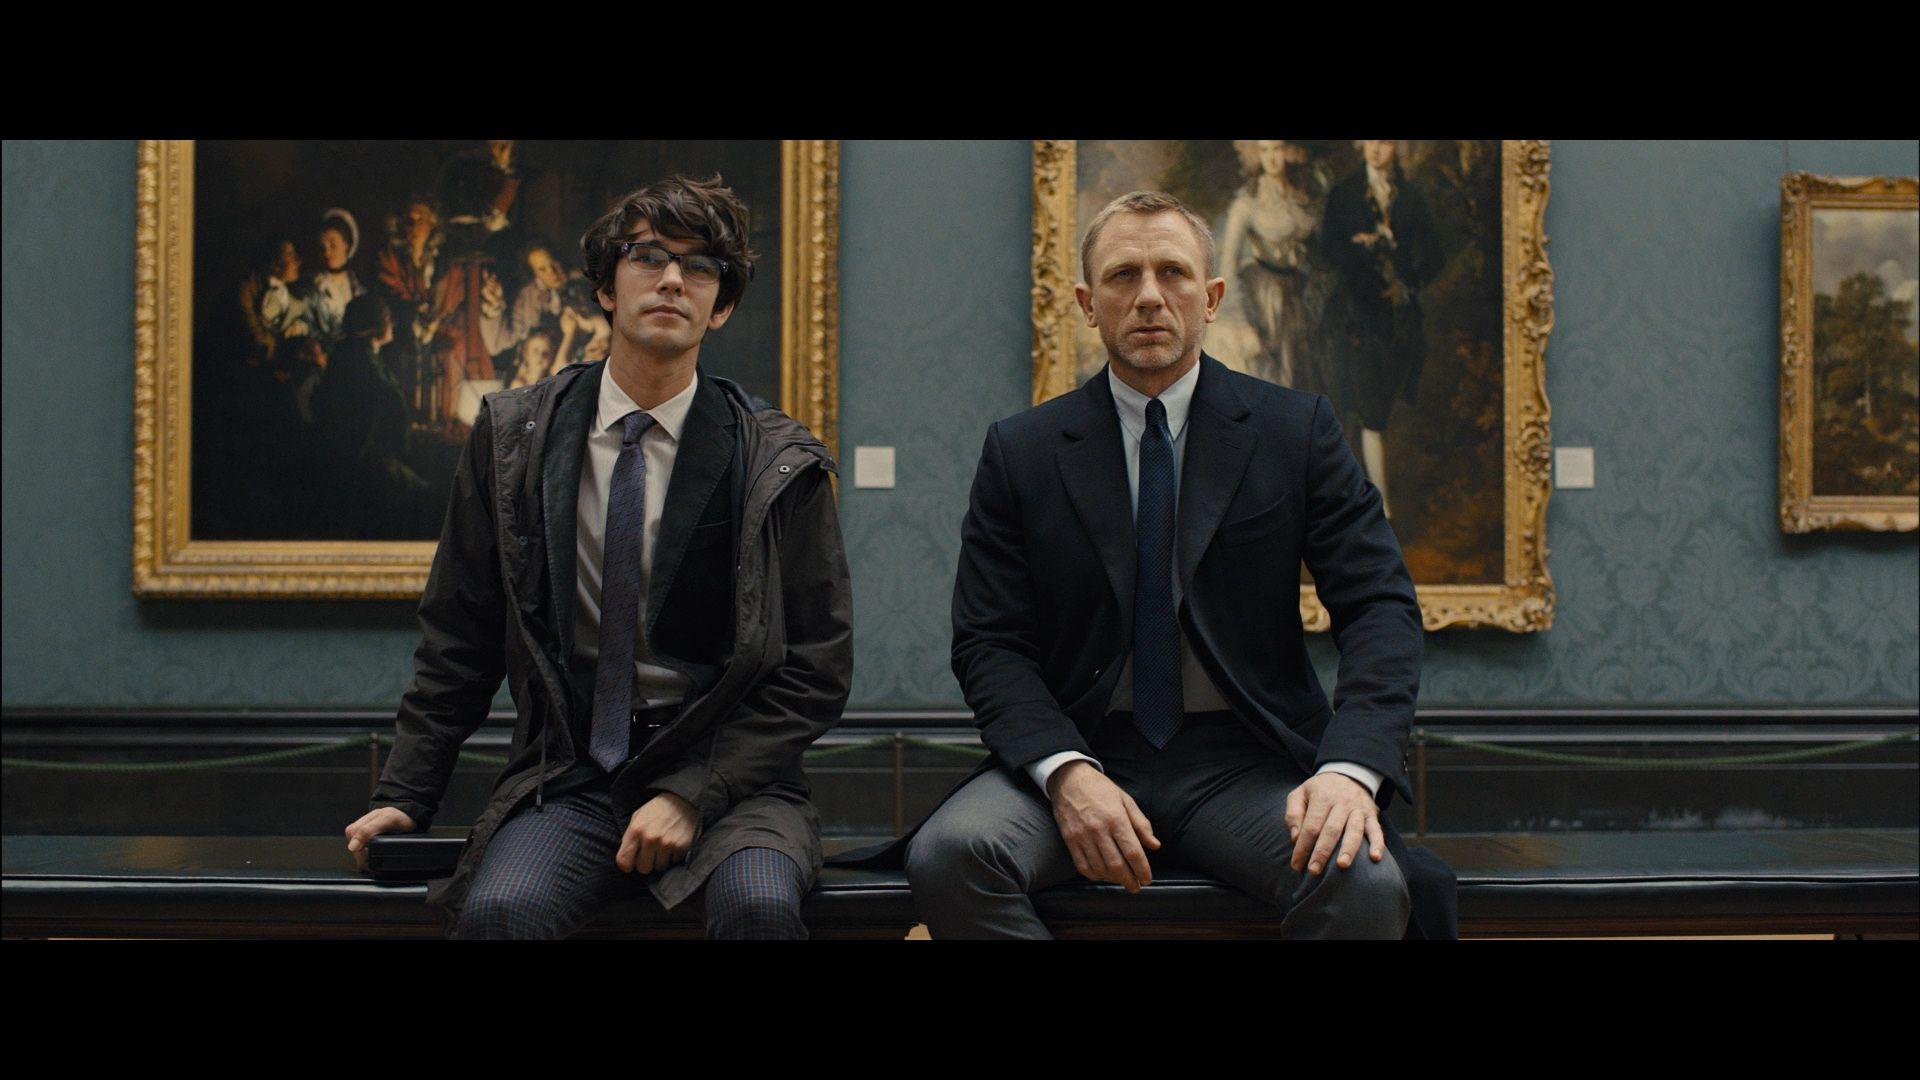 James Bond Skyfall Blu Ray Screenshot 0055887 I 1920 Jpg 1920 1080 James Bond Bond Suits Ben Whishaw